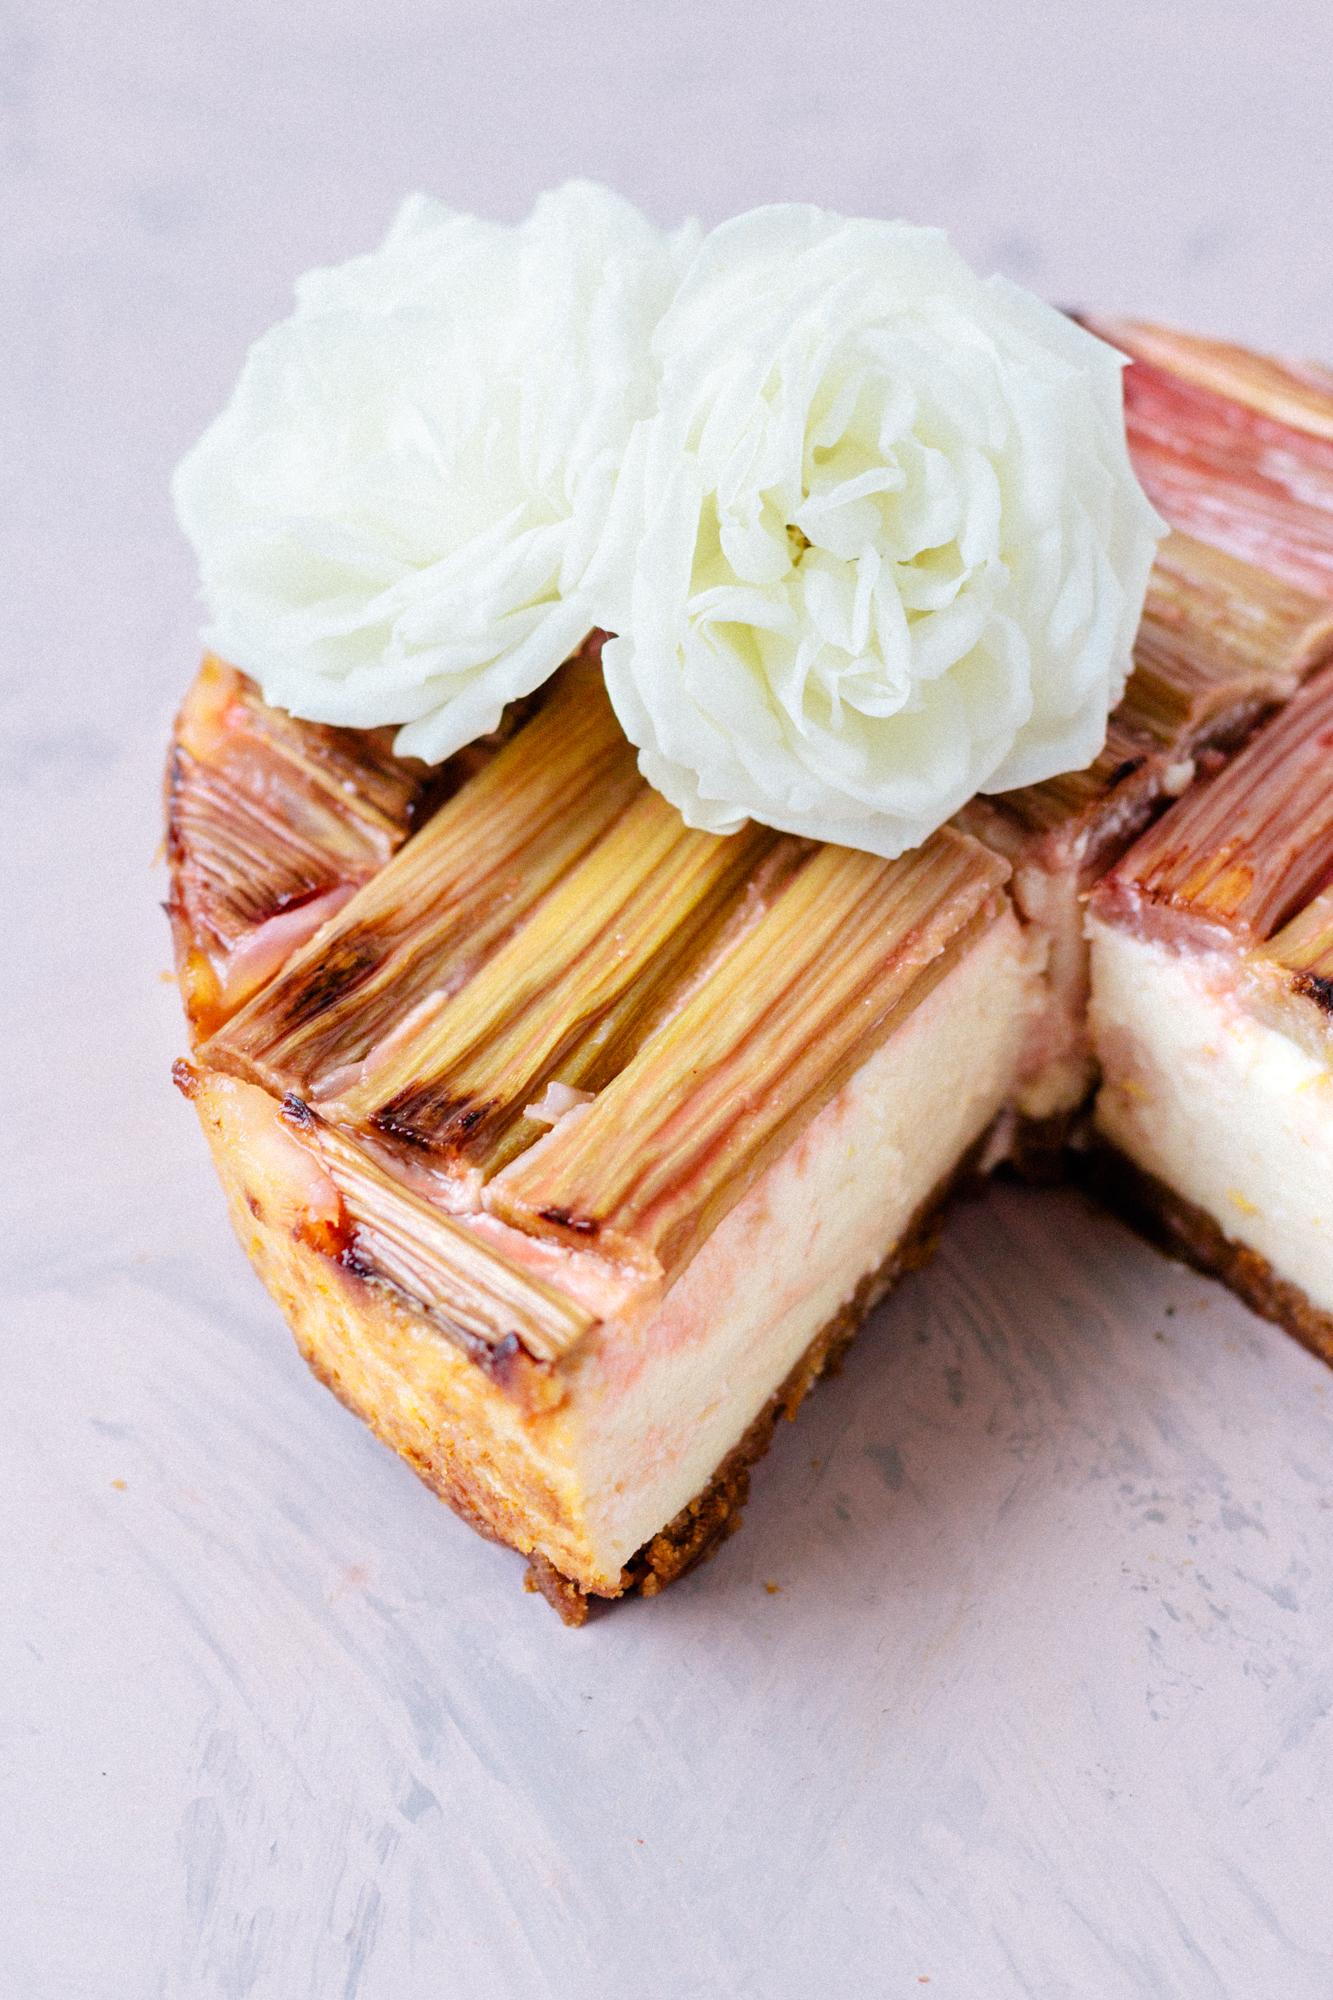 Vegan Baked Rhubarb Cheesecake (nut free & high in protein)